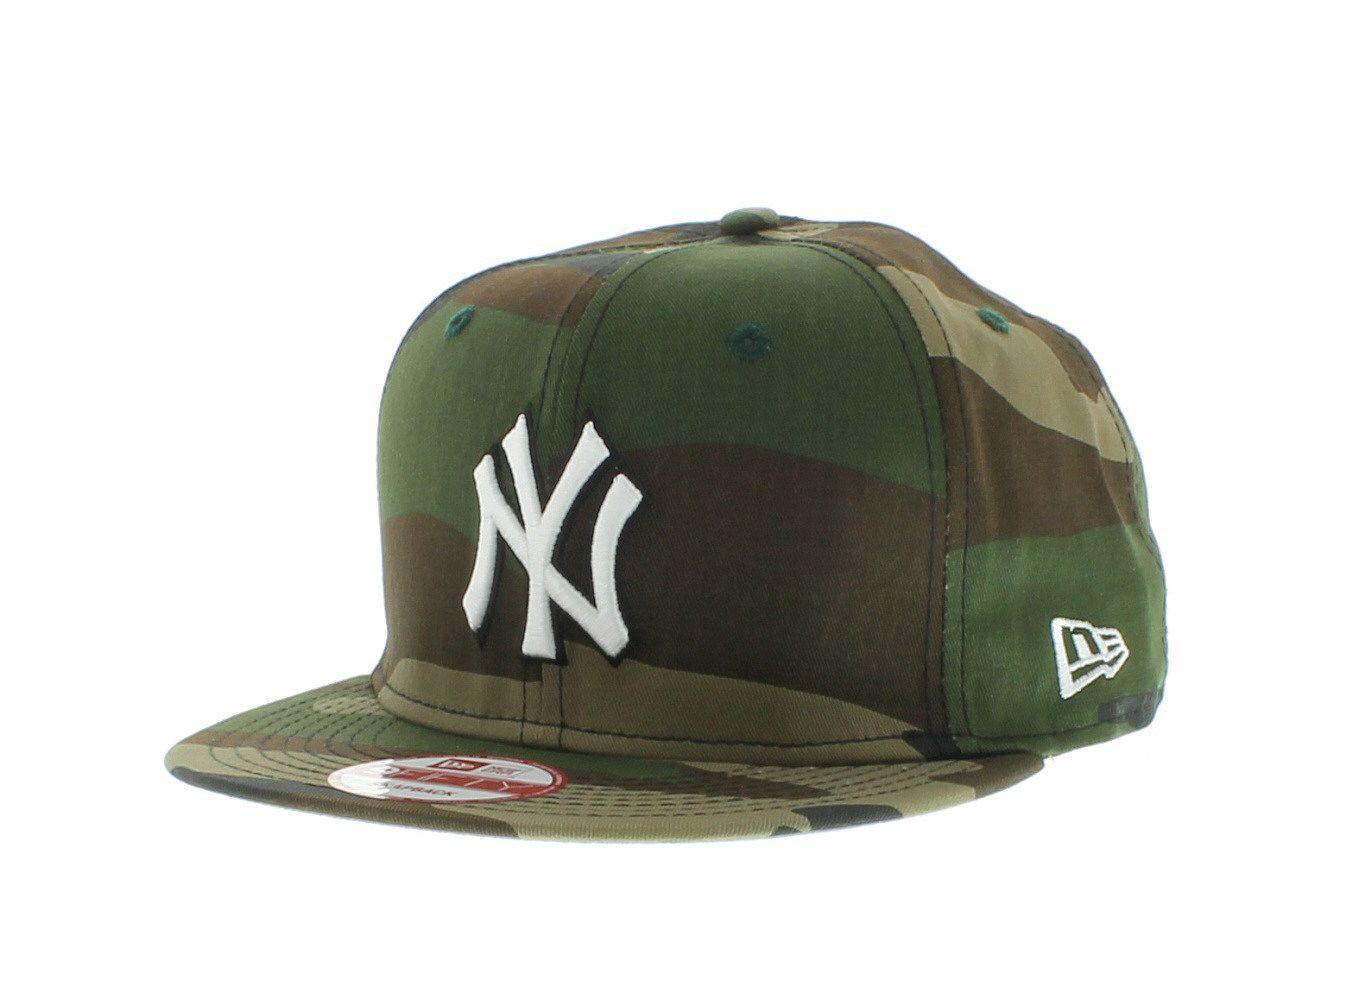 ... shopping 3 new york yankees mlb camo and white custom snapback 950  9fifty new era cap 8a8183cf9335